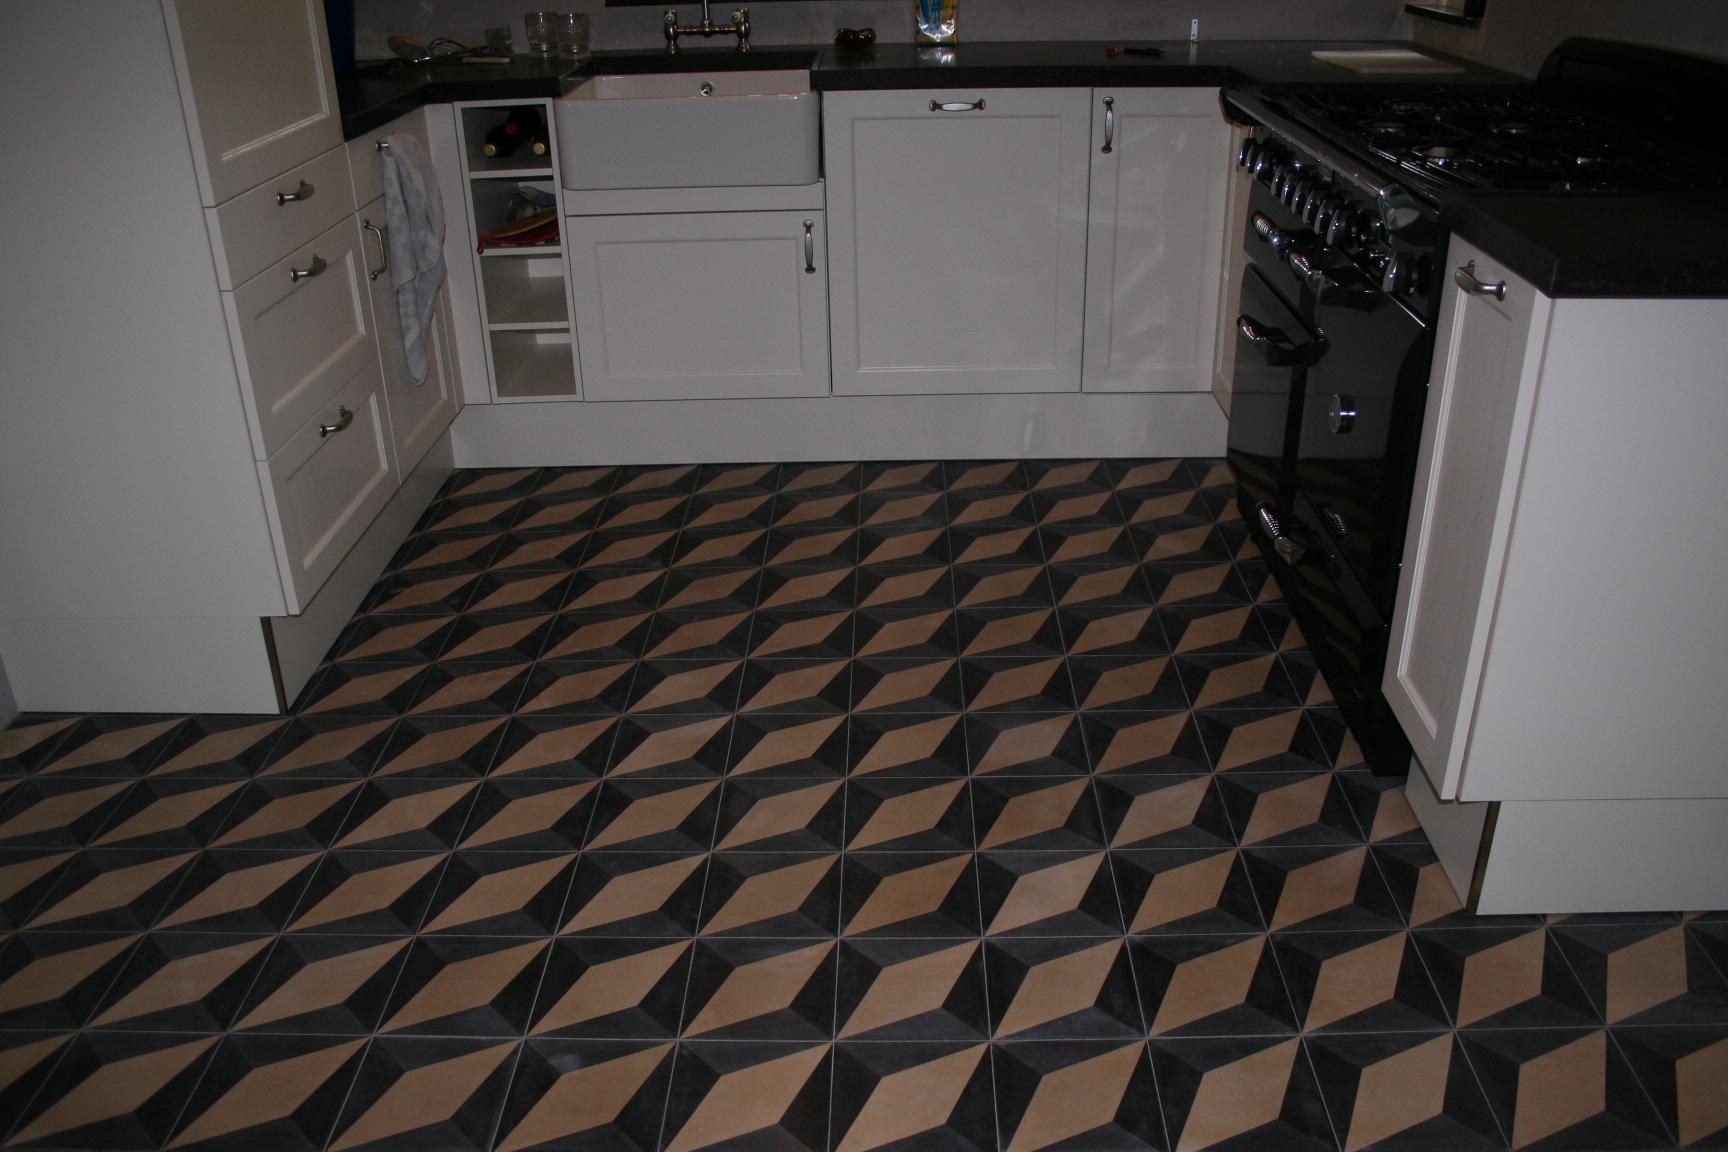 Caradeco vloer 10-07-2009 002